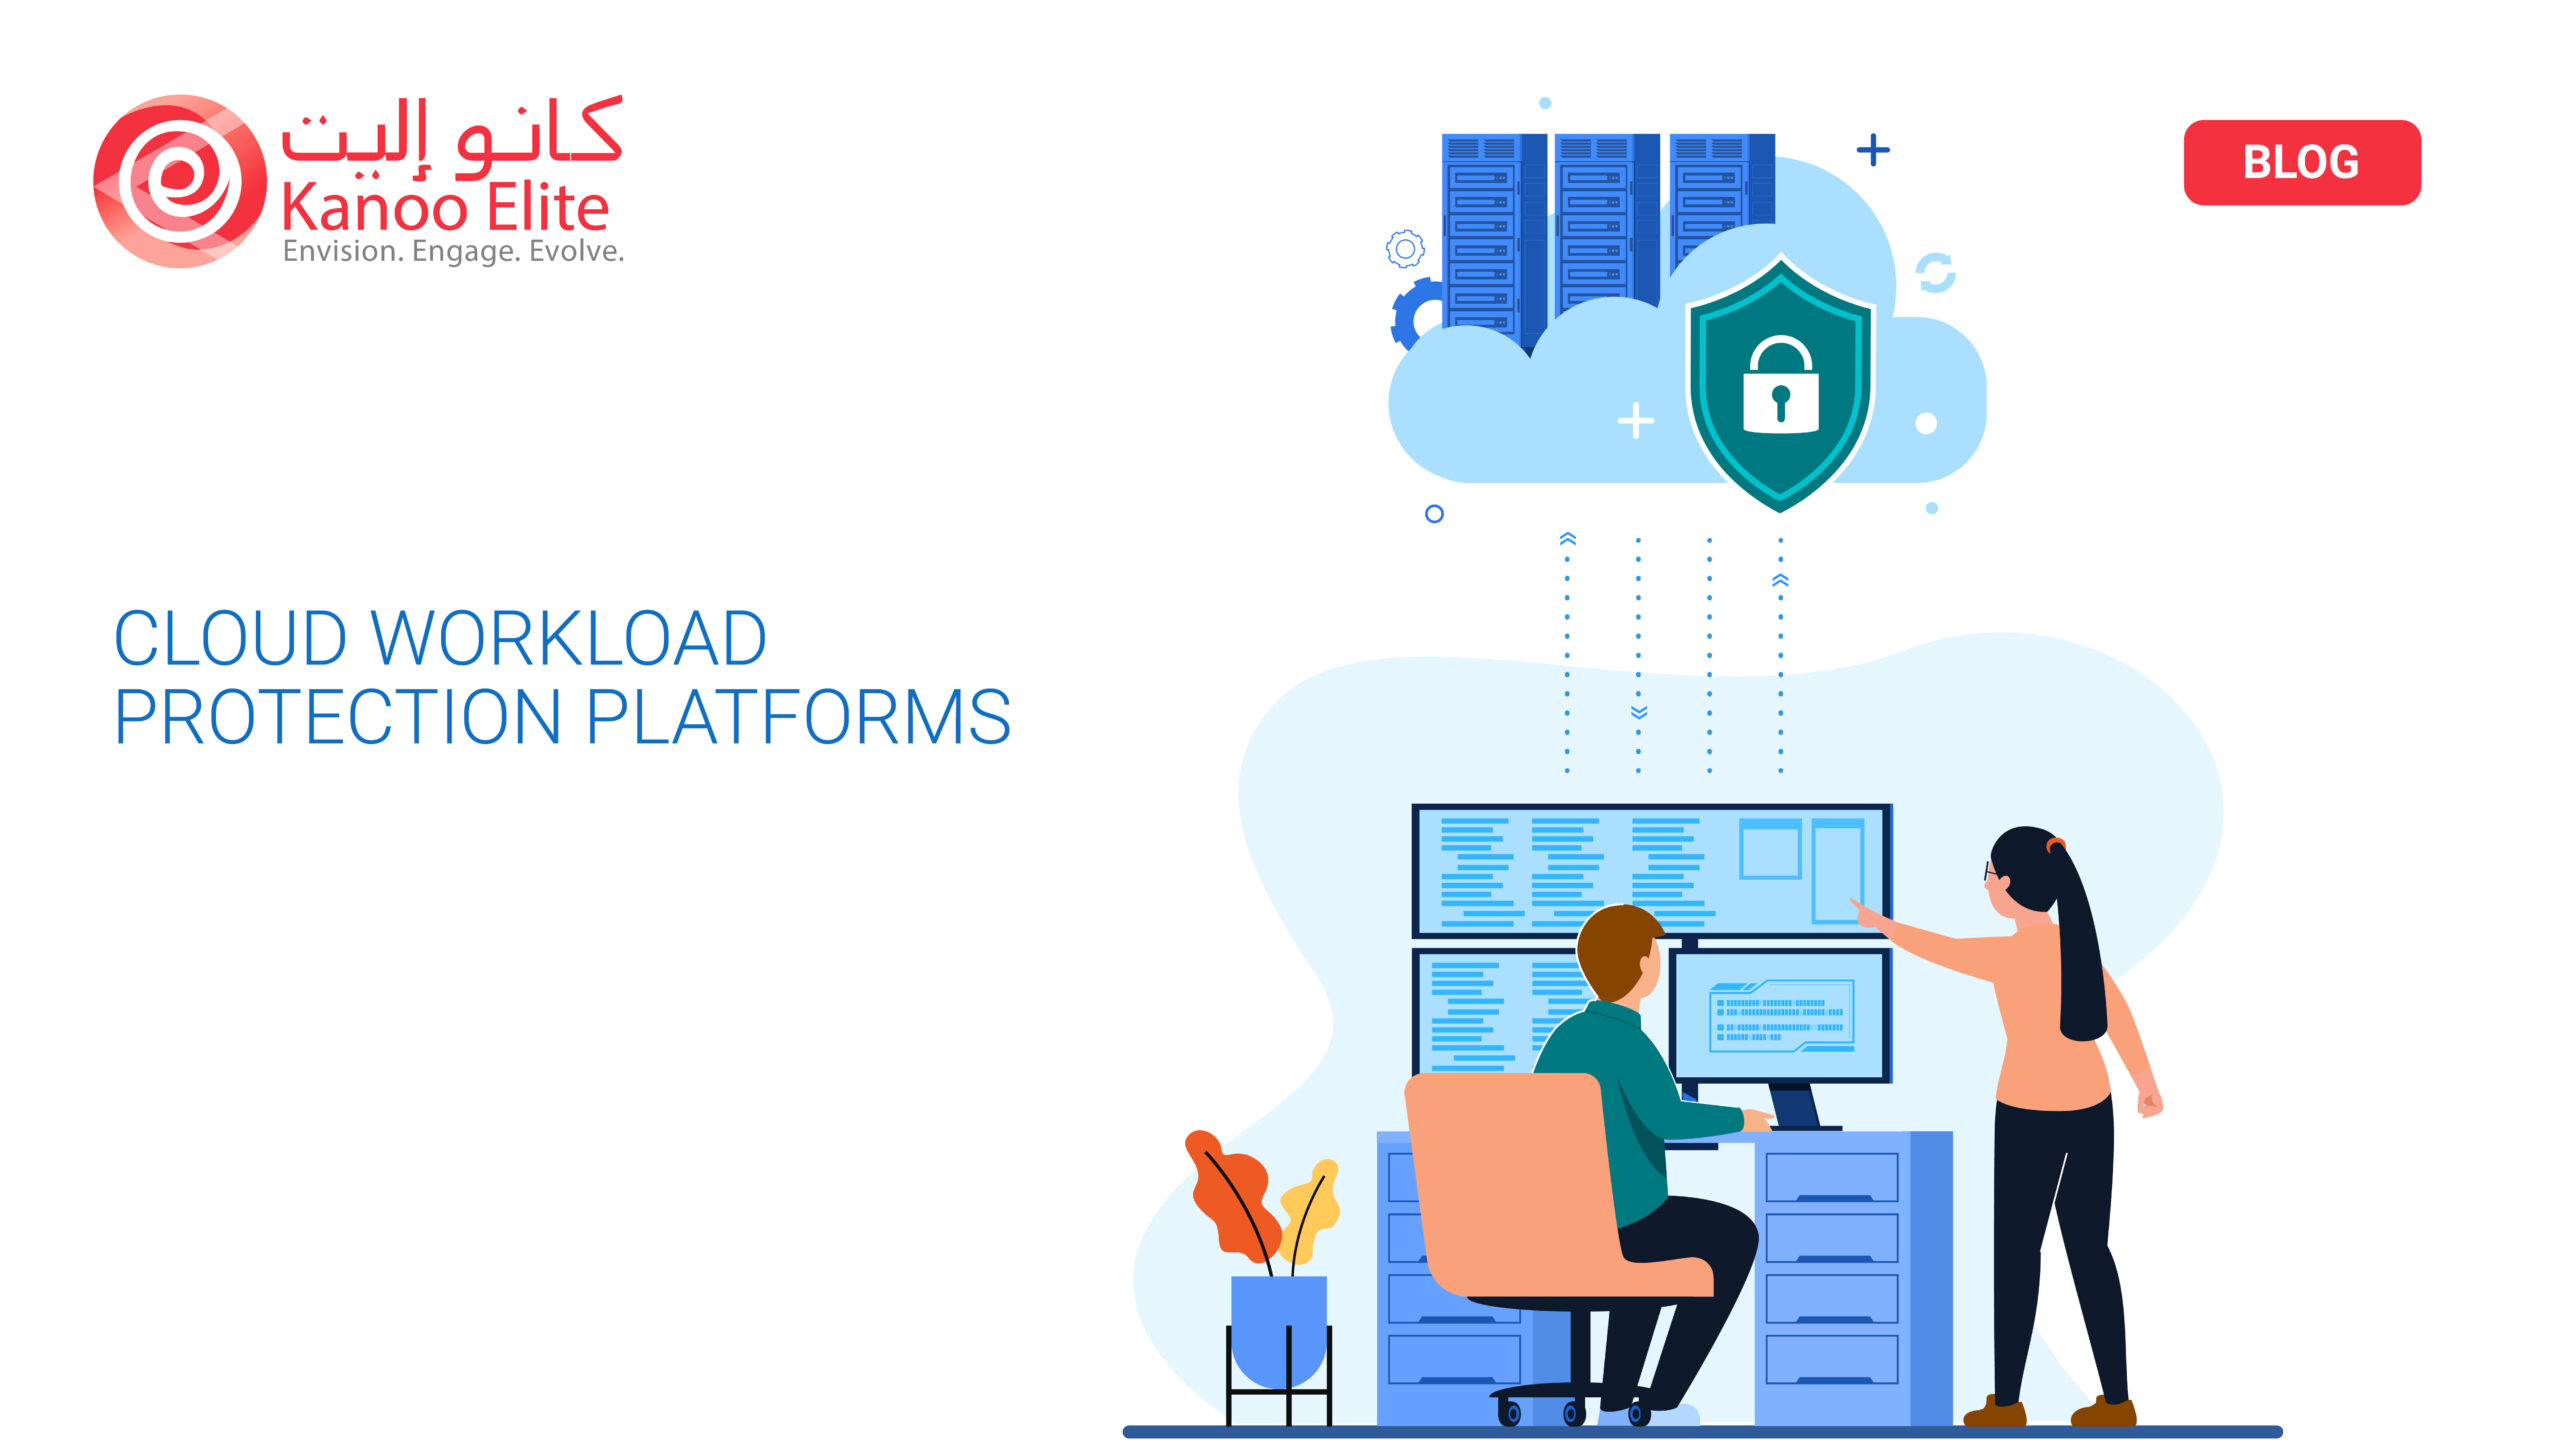 Cloud Workload Protection Platforms